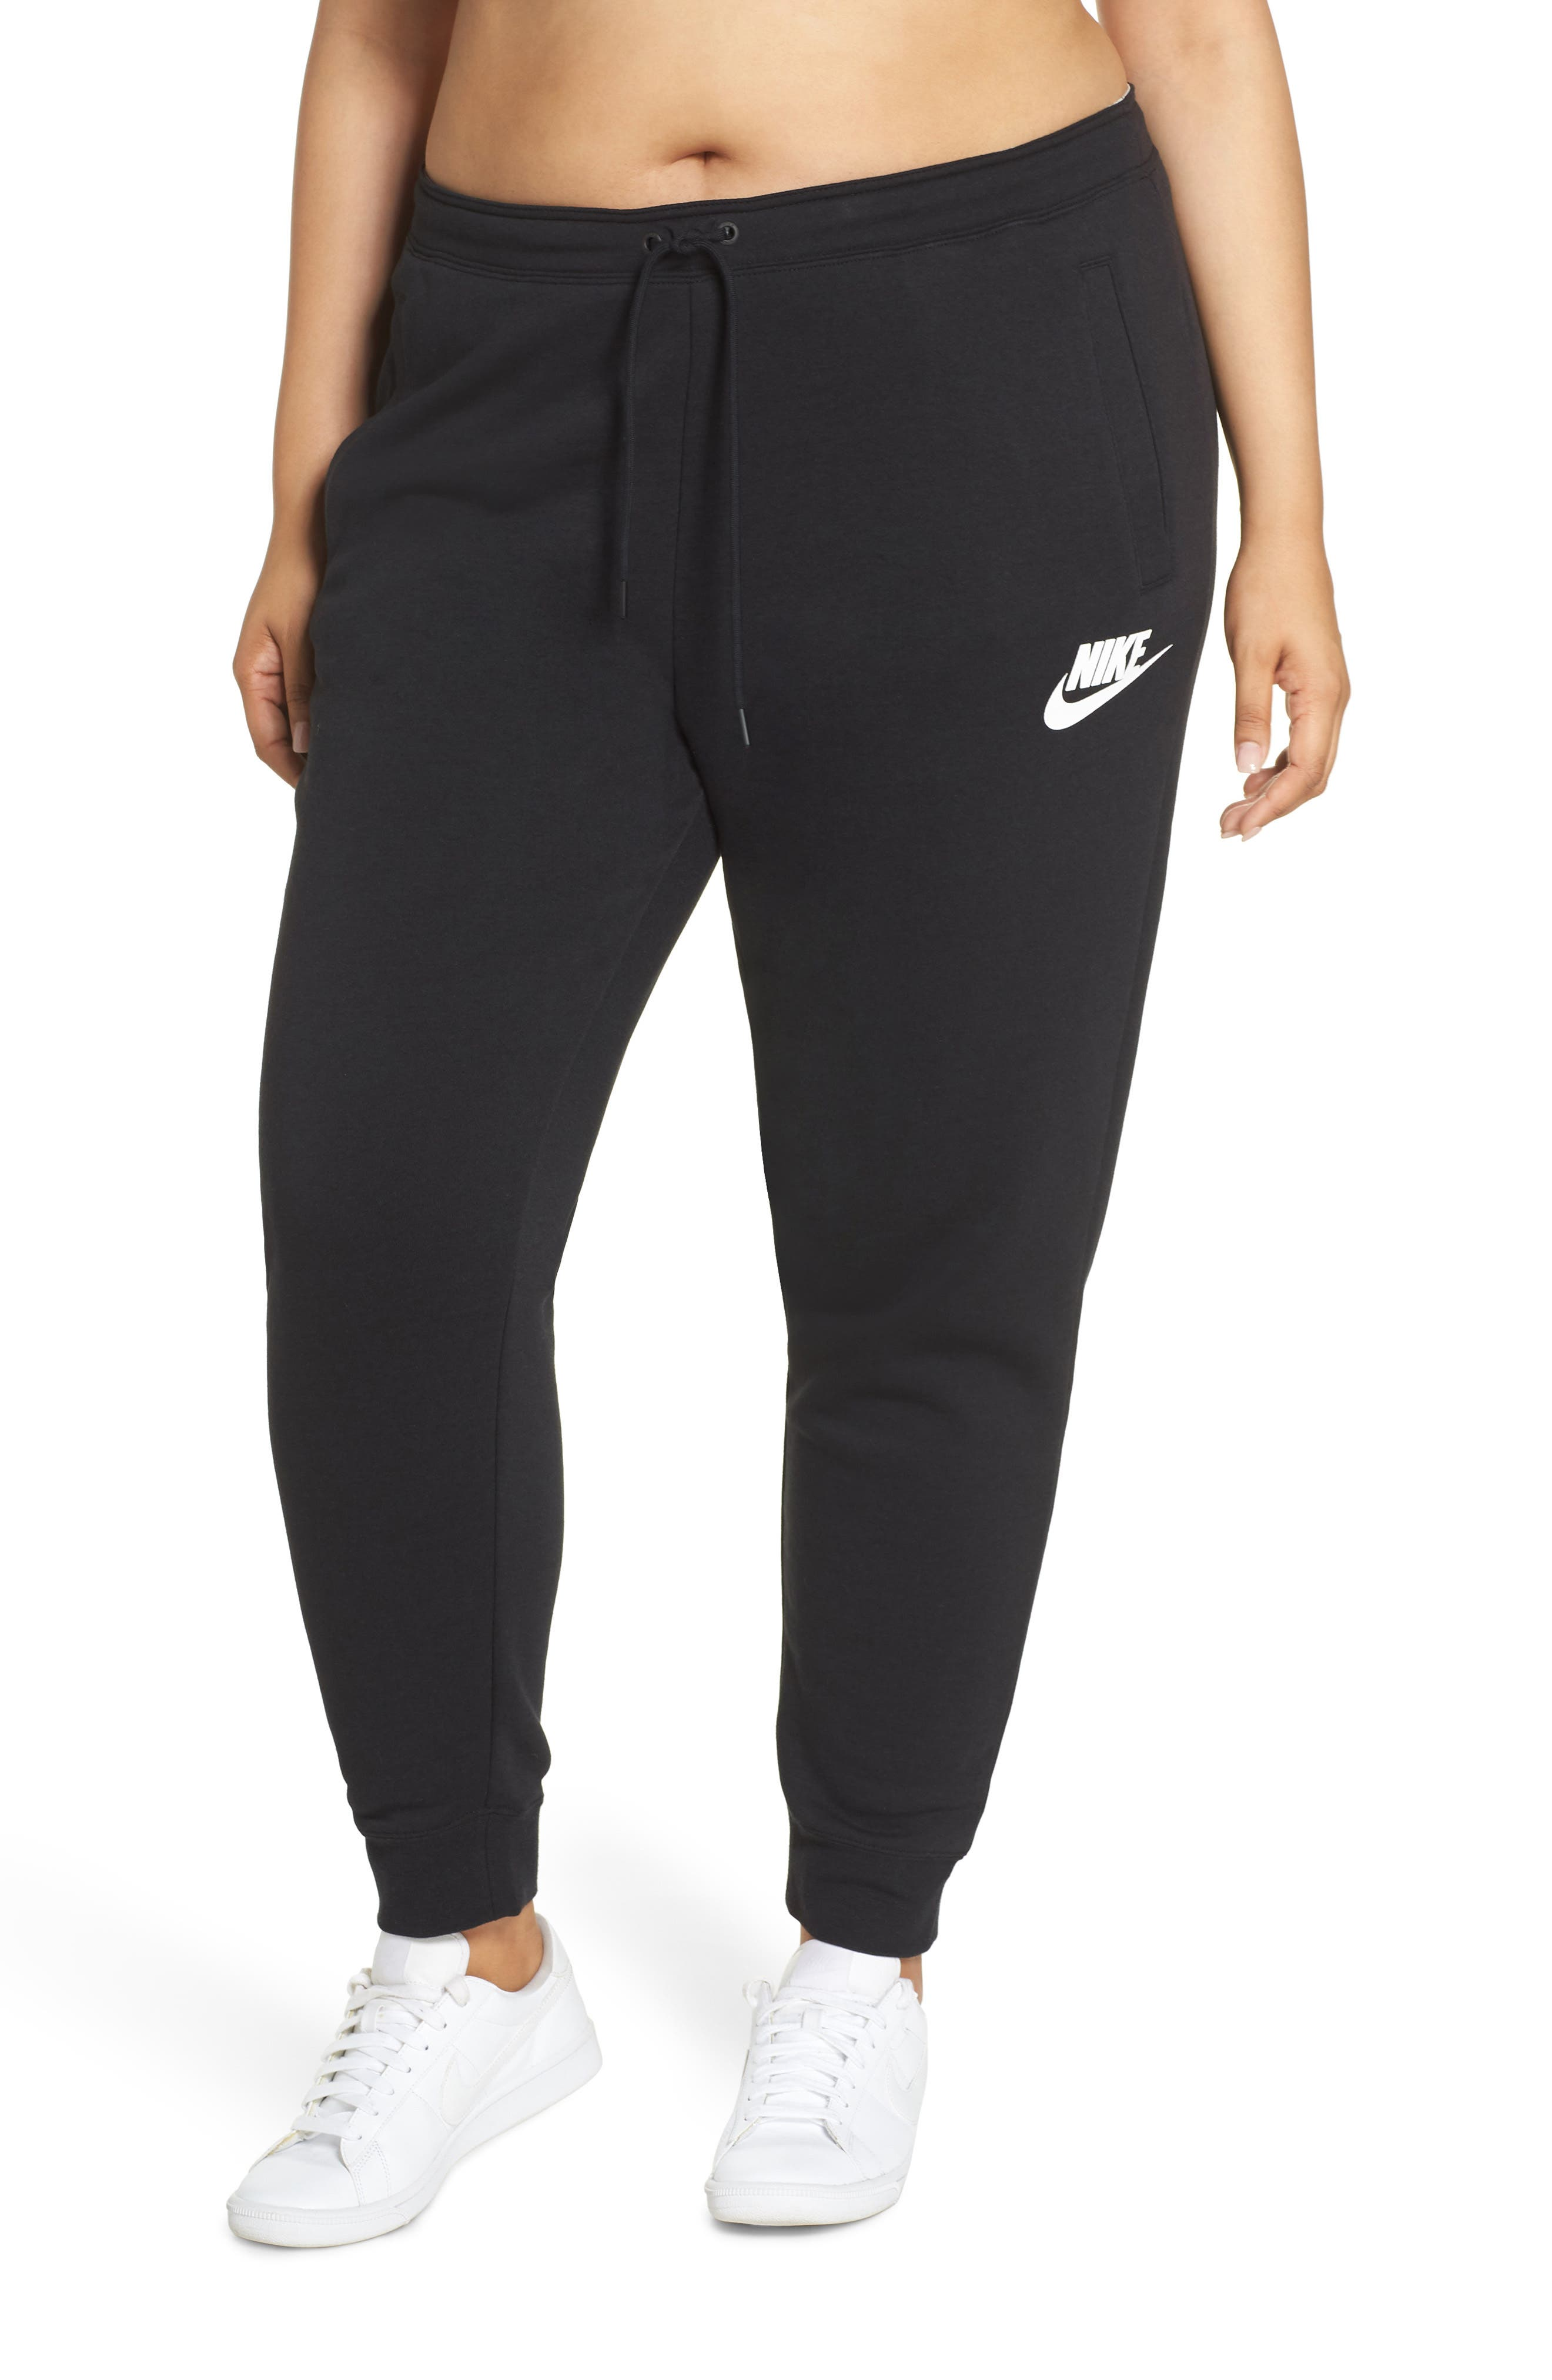 NIKE Sportswear Rally High Rise Jogger Pants, Main, color, BLACK/ BLACK/ WHITE